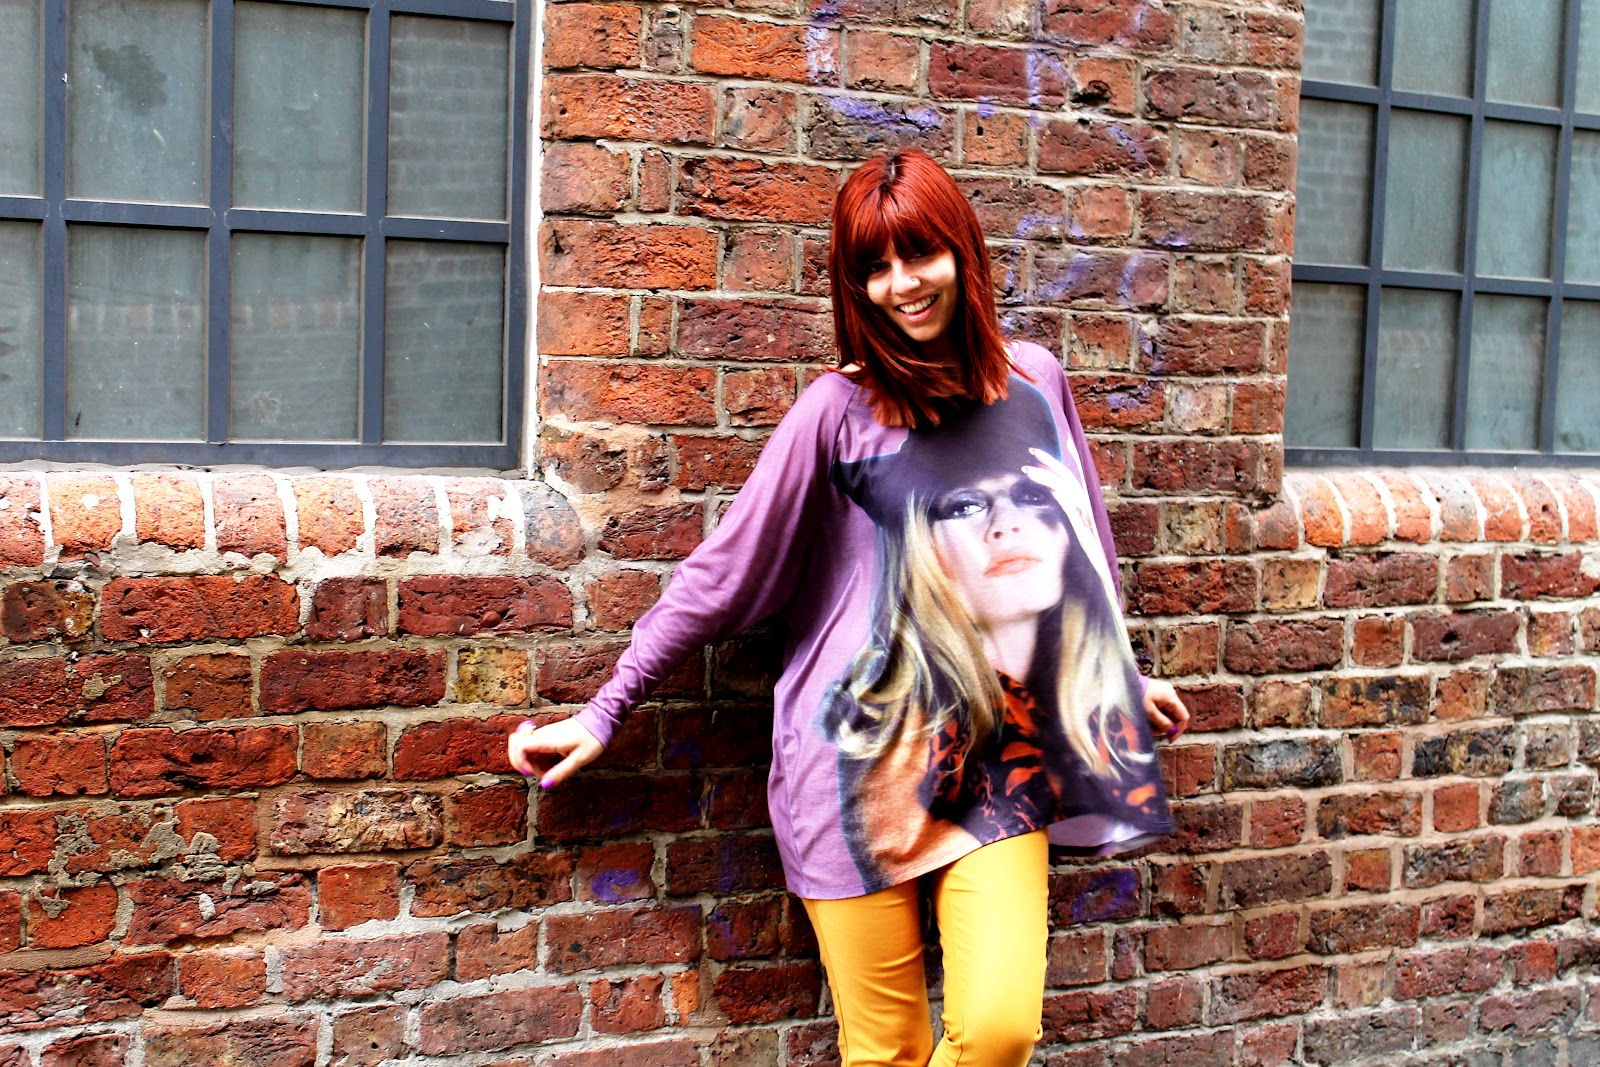 http://2.bp.blogspot.com/-kPxNLzmNPUc/UBGbUeuh3vI/AAAAAAAAKsg/c9cRYuz30Yw/s1600/Brigitte+Bardot+top+2.jpg